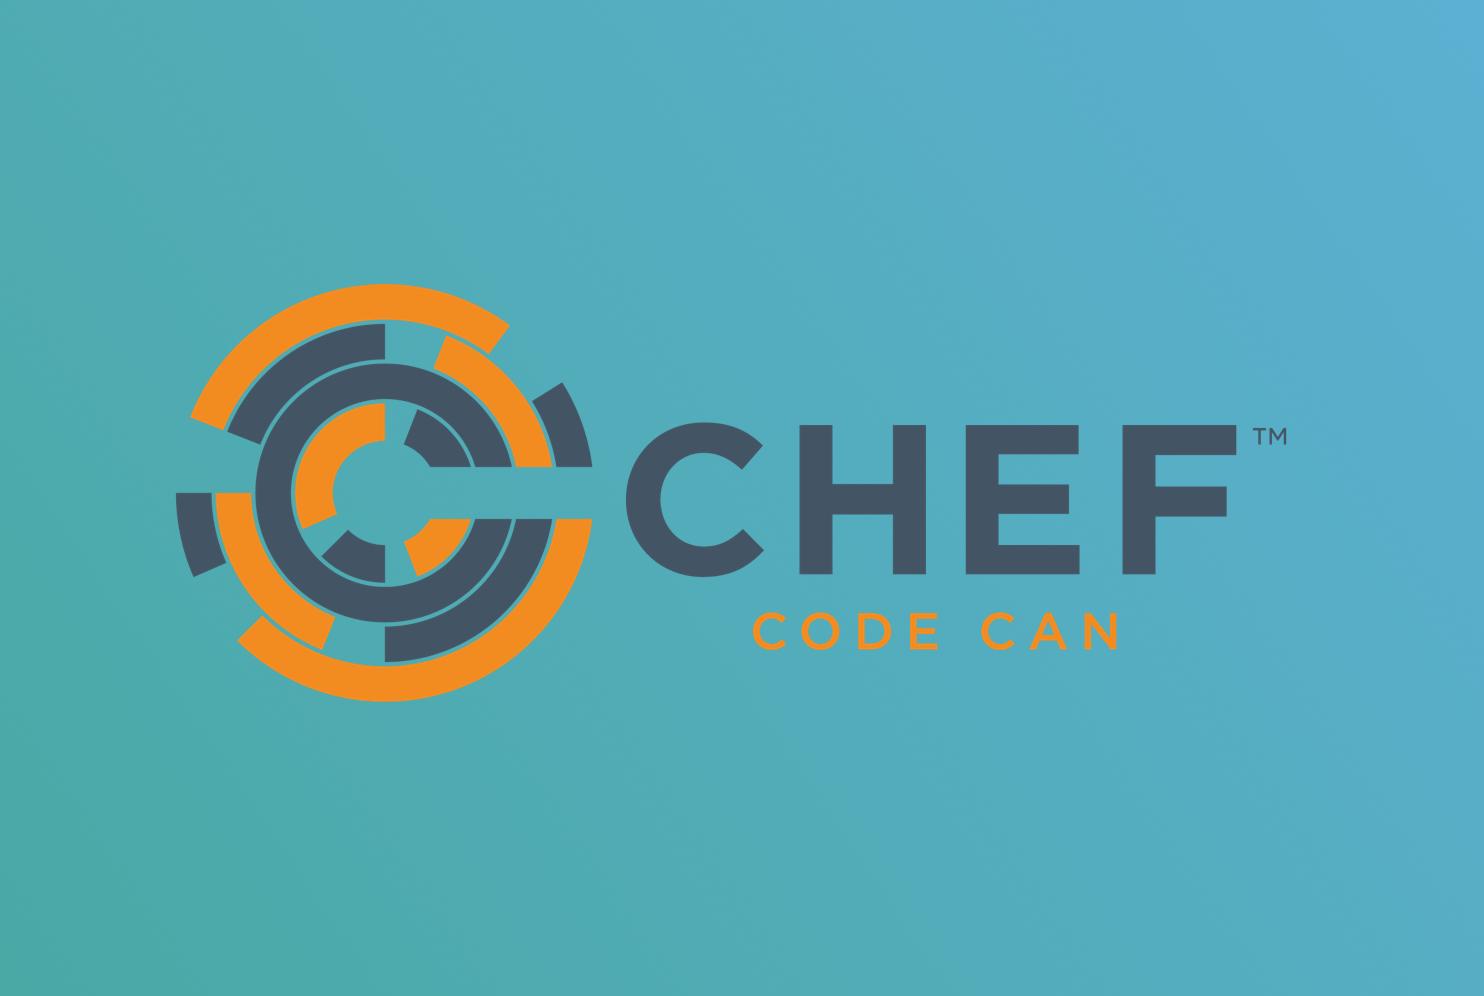 Levvel Blog - Levvel Up Your DevOps Game With Chef Custom Ohai Plugins